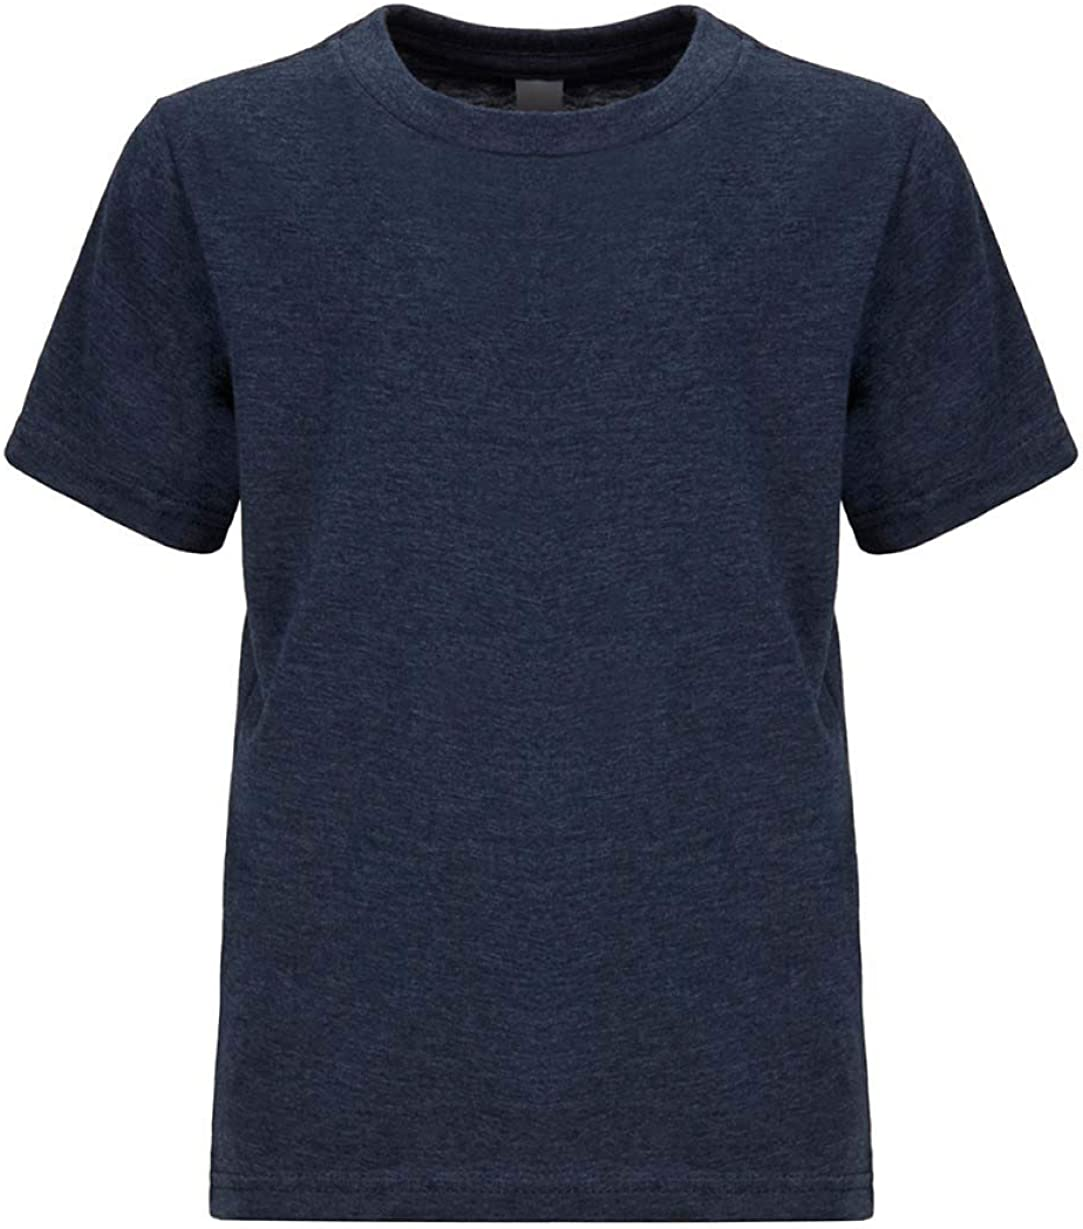 Next Level Kids CVC Crew Neck T-Shirt Midnight Navy XS